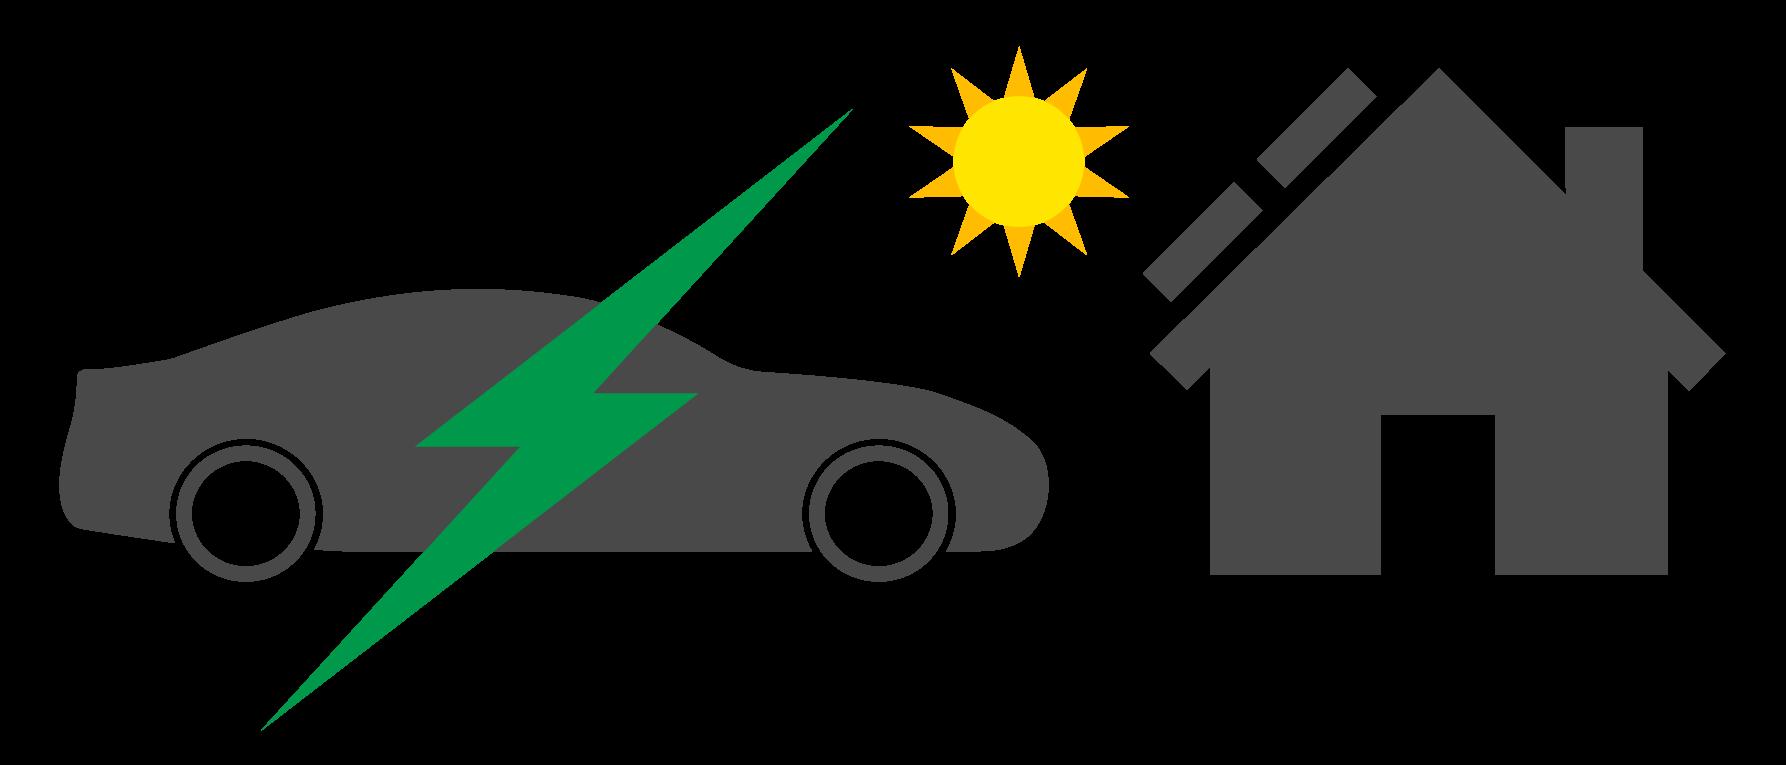 Kosten Elektrische Auto Berekenen 2019 Mountox